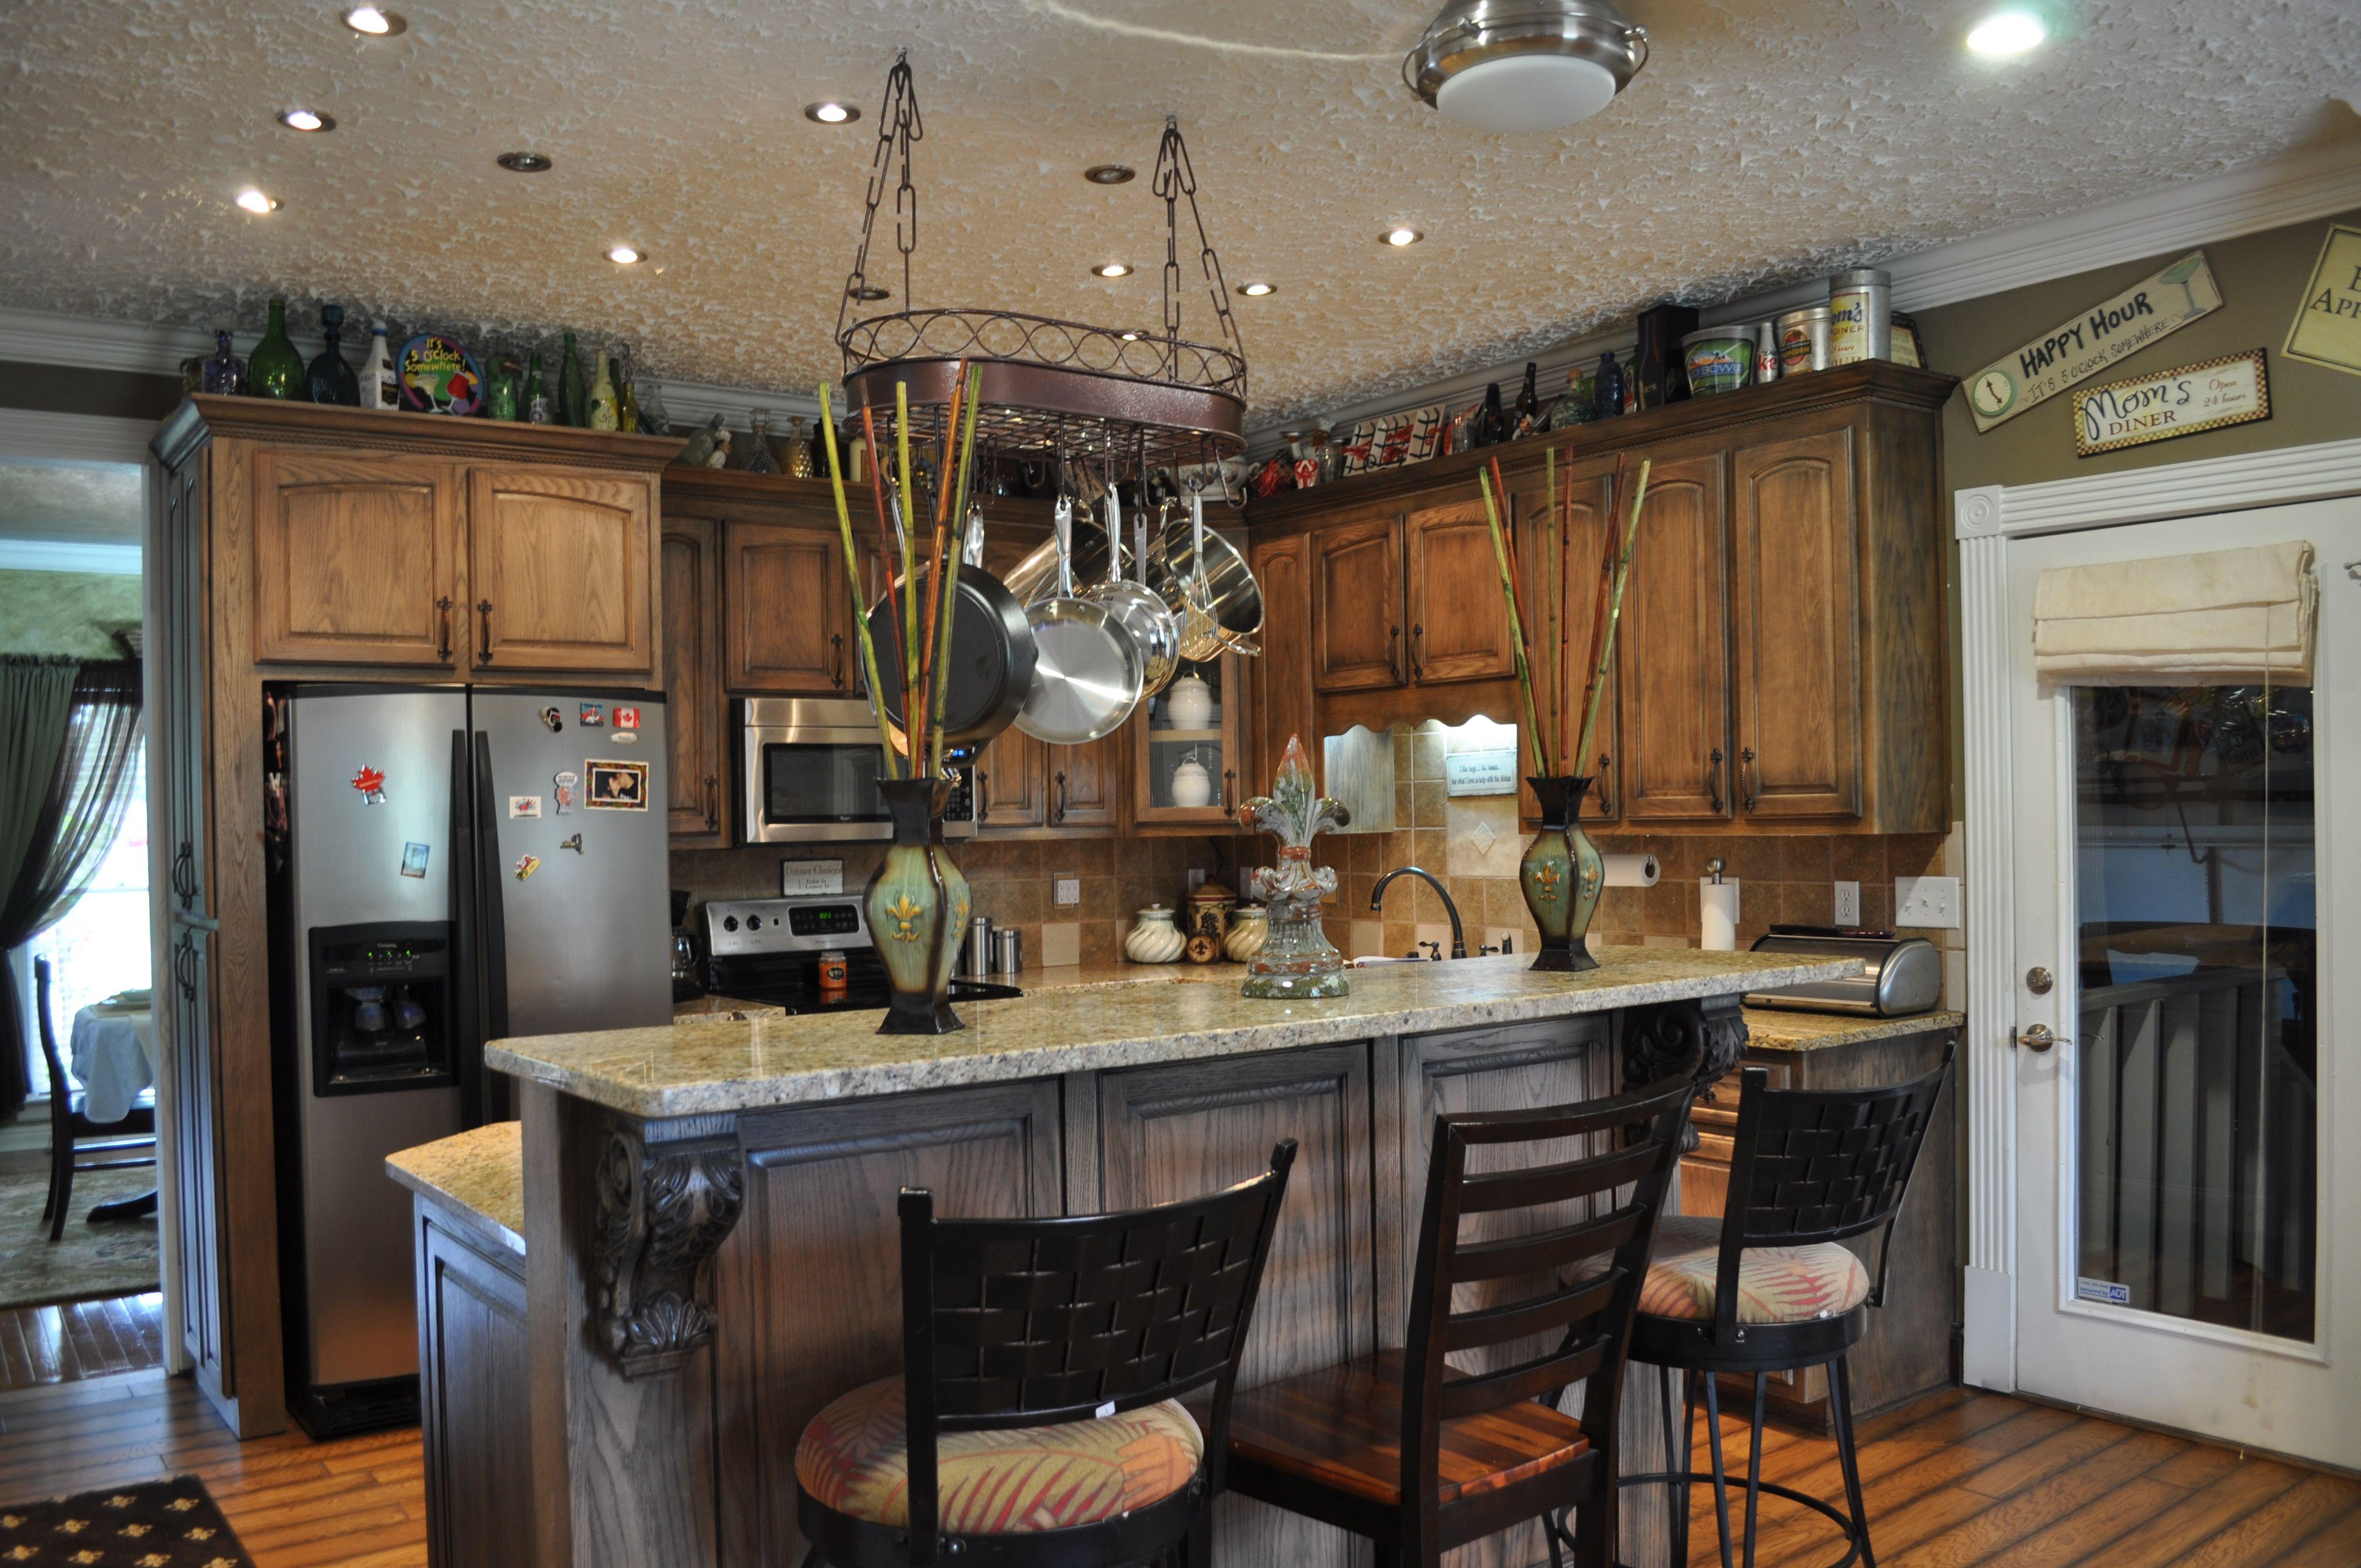 My New Kitchen - by CCI of Huntsville, AL | New kitchen ...